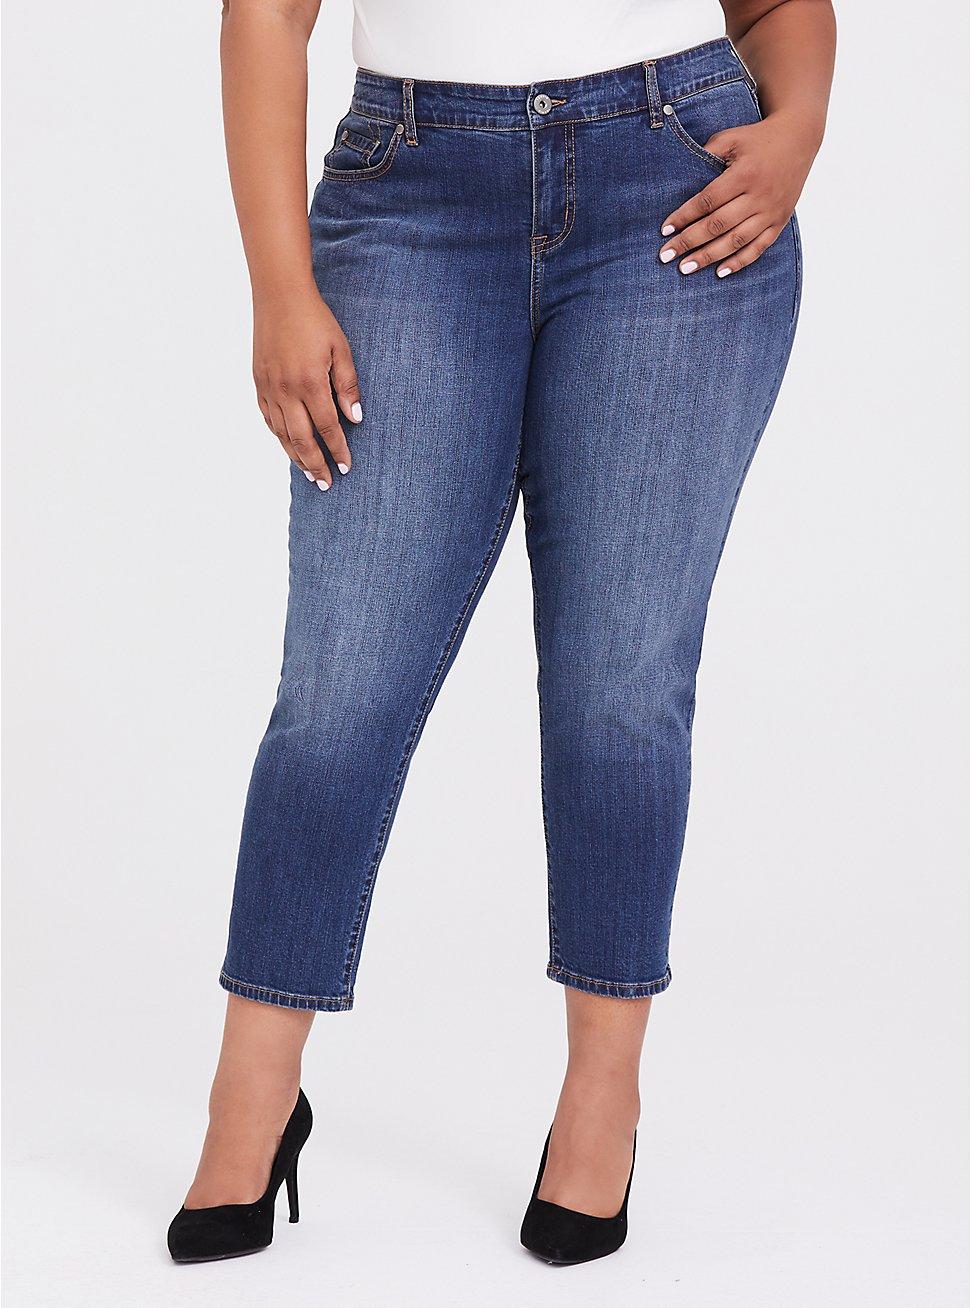 Mid Rise Straight Jean - Vintage Stretch Medium Wash, CLOVERDALE, hi-res